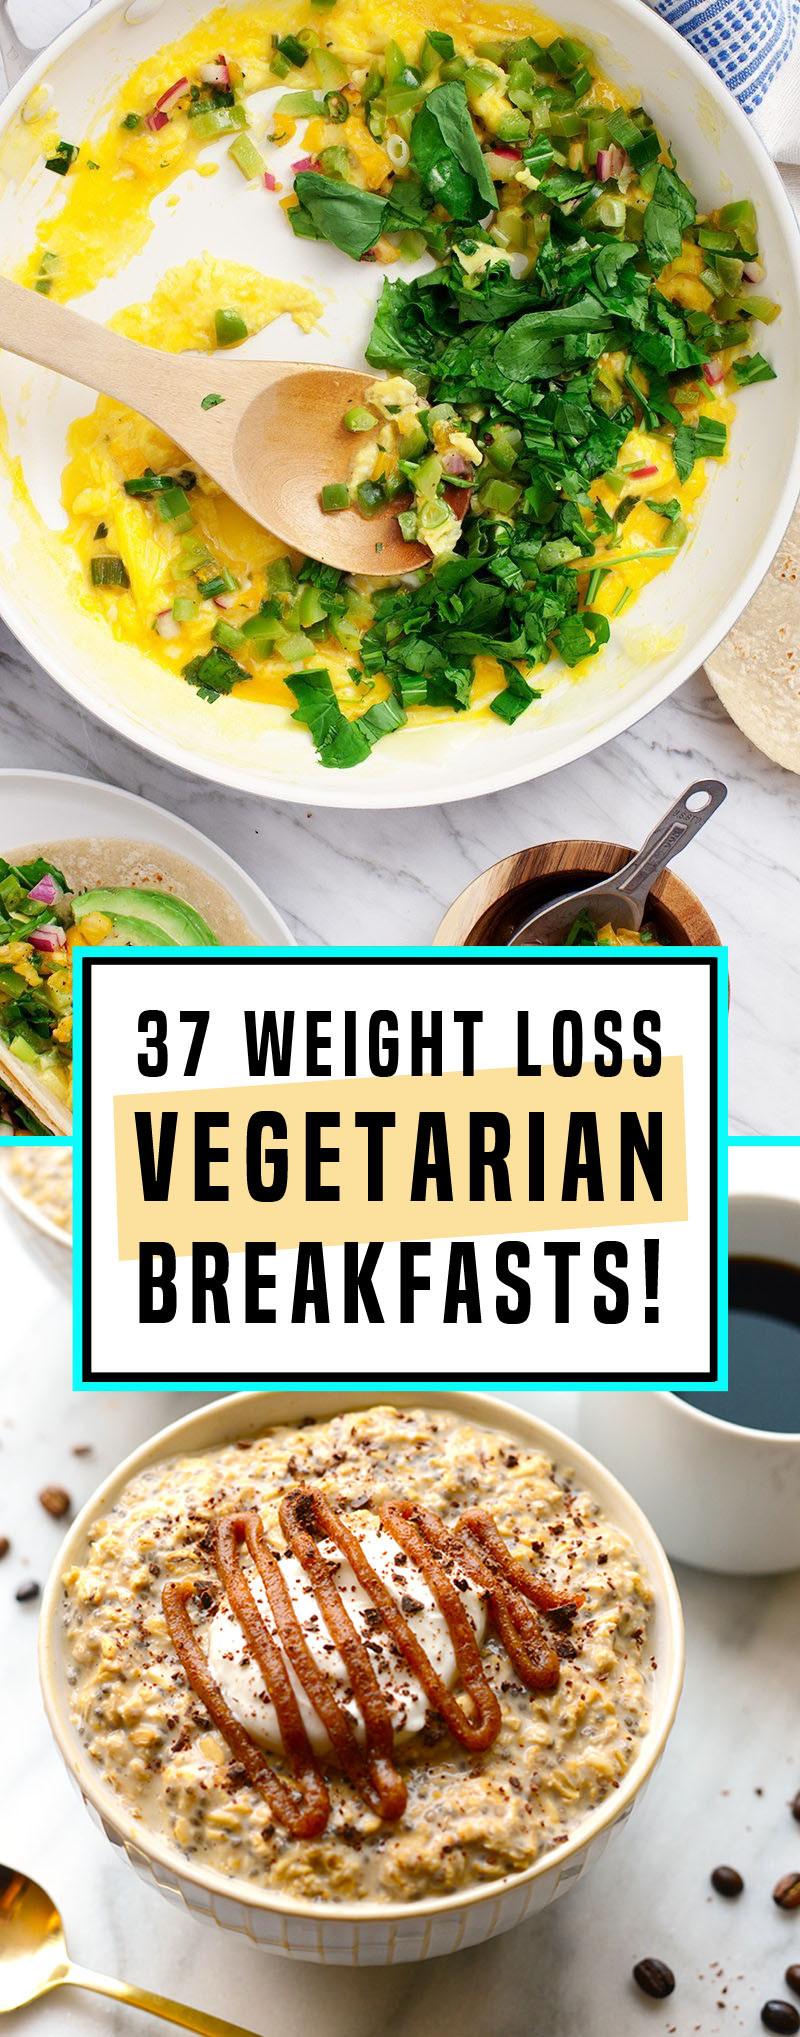 Healthy Vegan Breakfast For Weight Loss  37 Ve arian Breakfasts For The Perfect Weight Loss Start